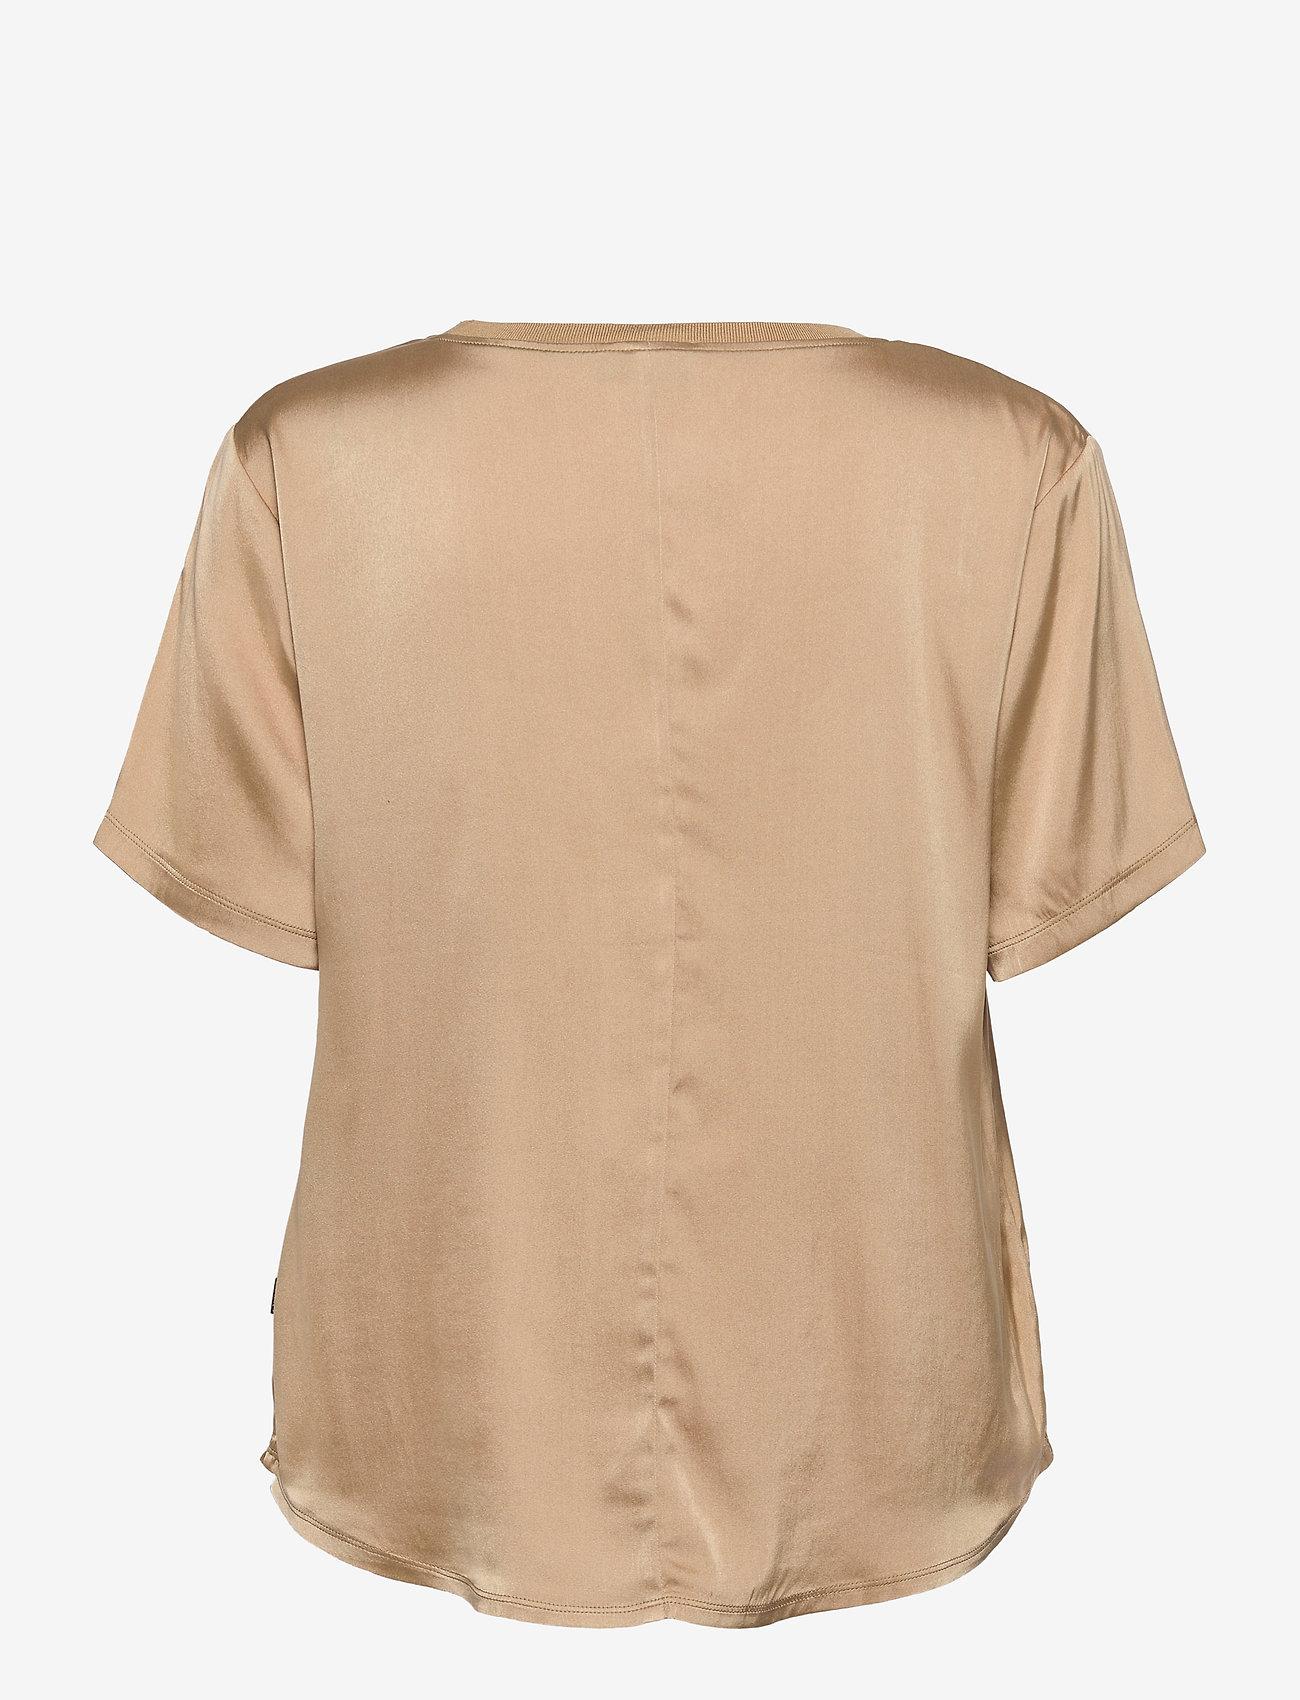 SAND - 3176 SW - Minerva - blouses met korte mouwen - light camel - 1